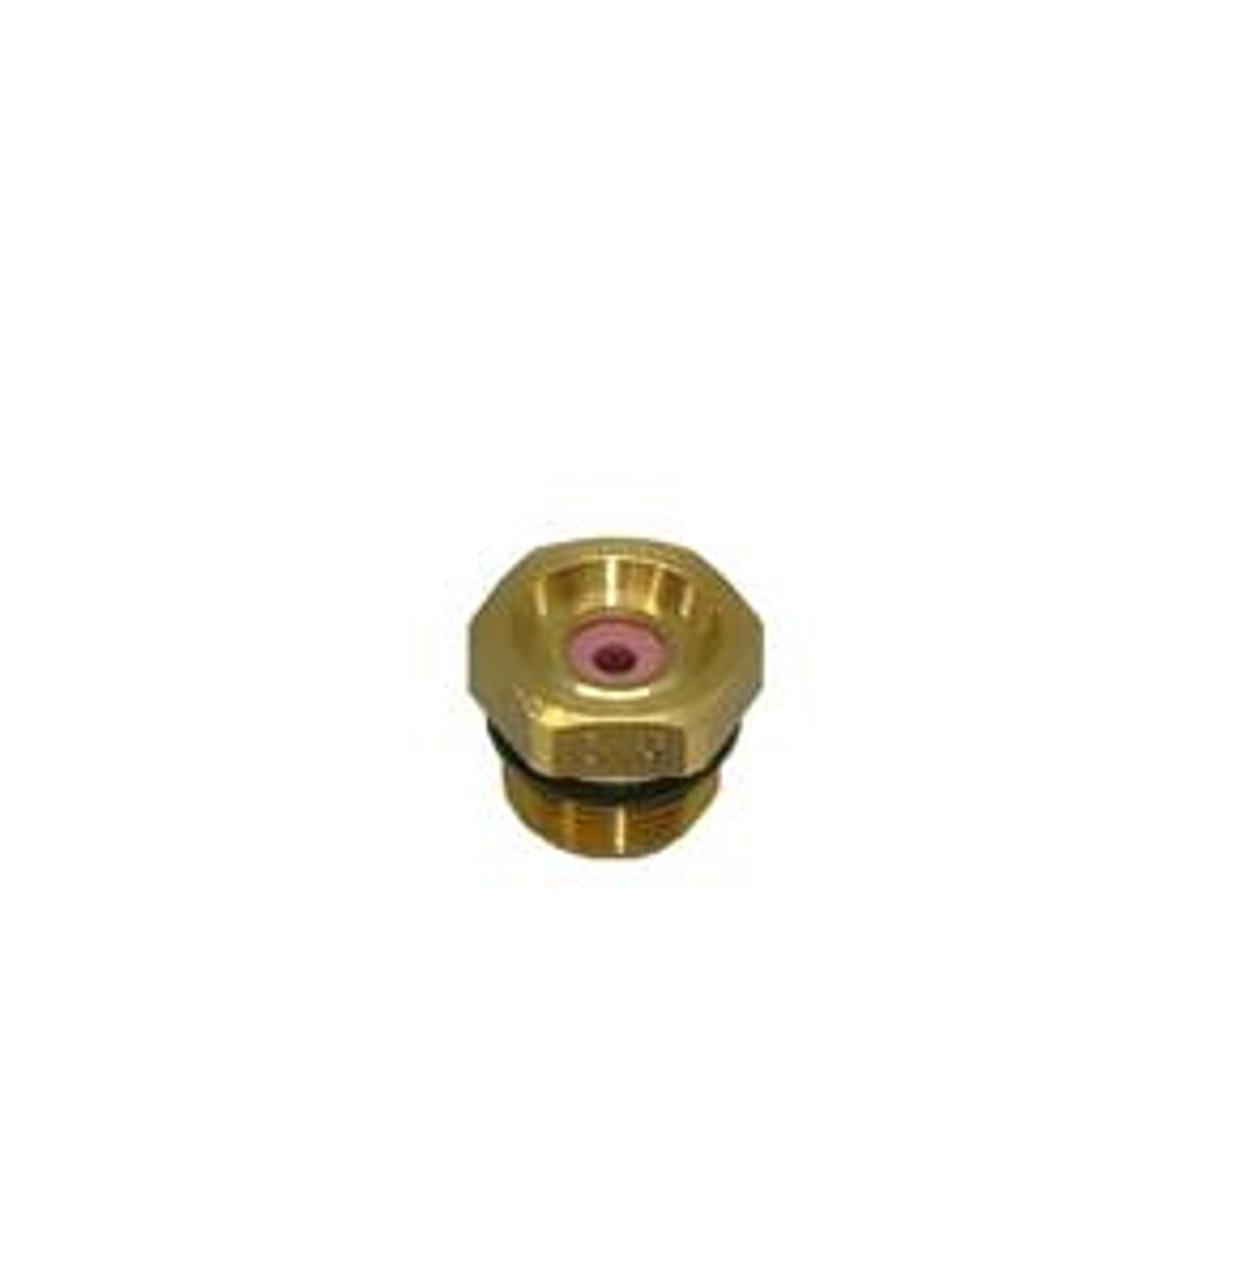 Nozzle for Turbo 400 gun - 1.8mm ceramic